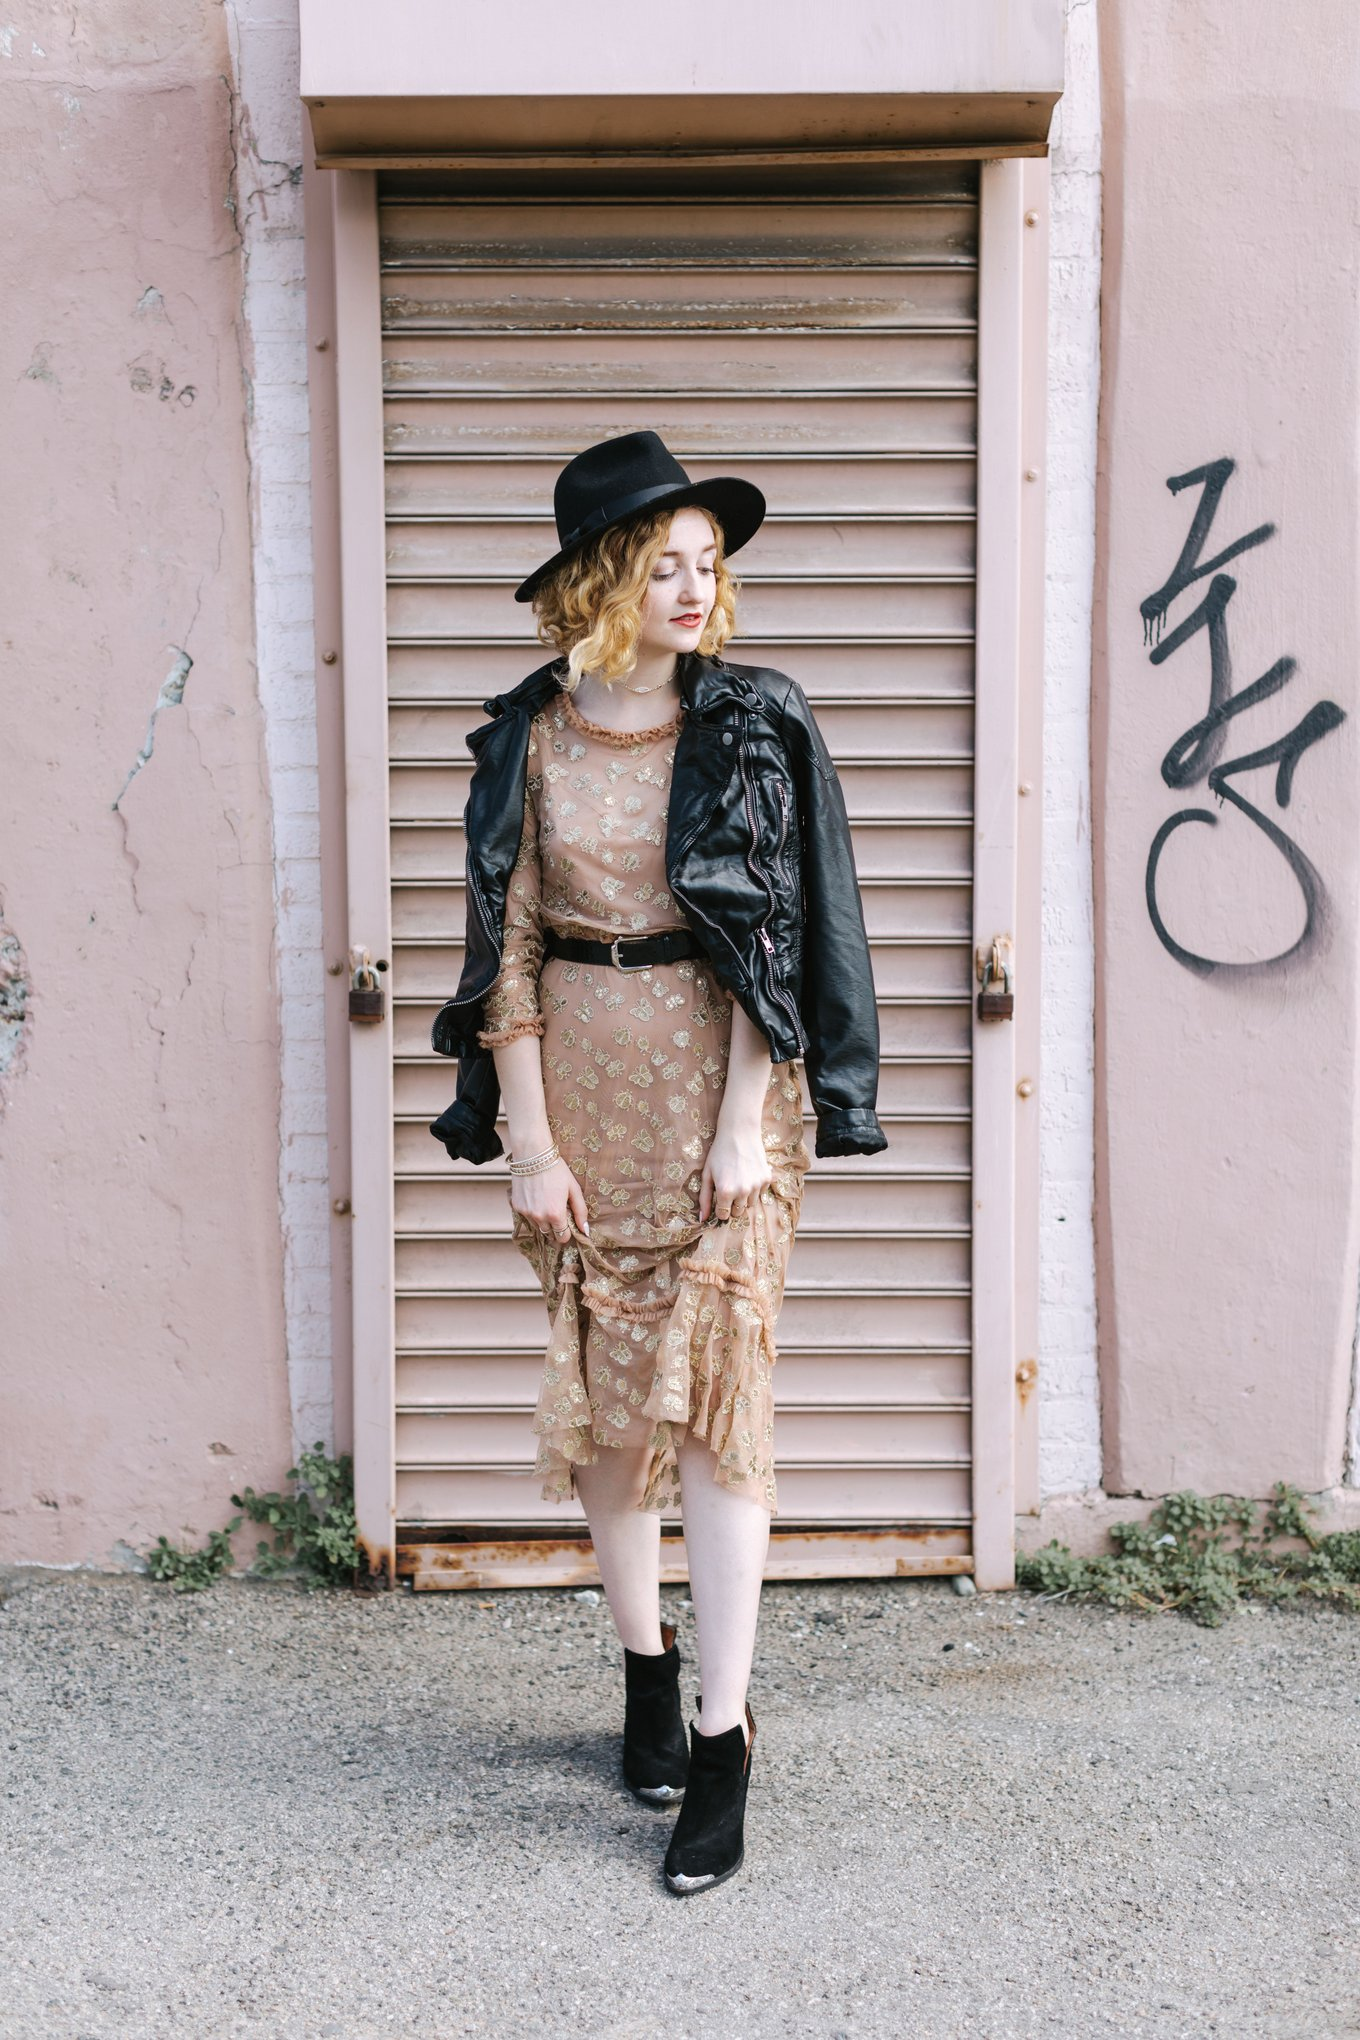 Boston_Fashion_Photographer_Lena_11.jpg